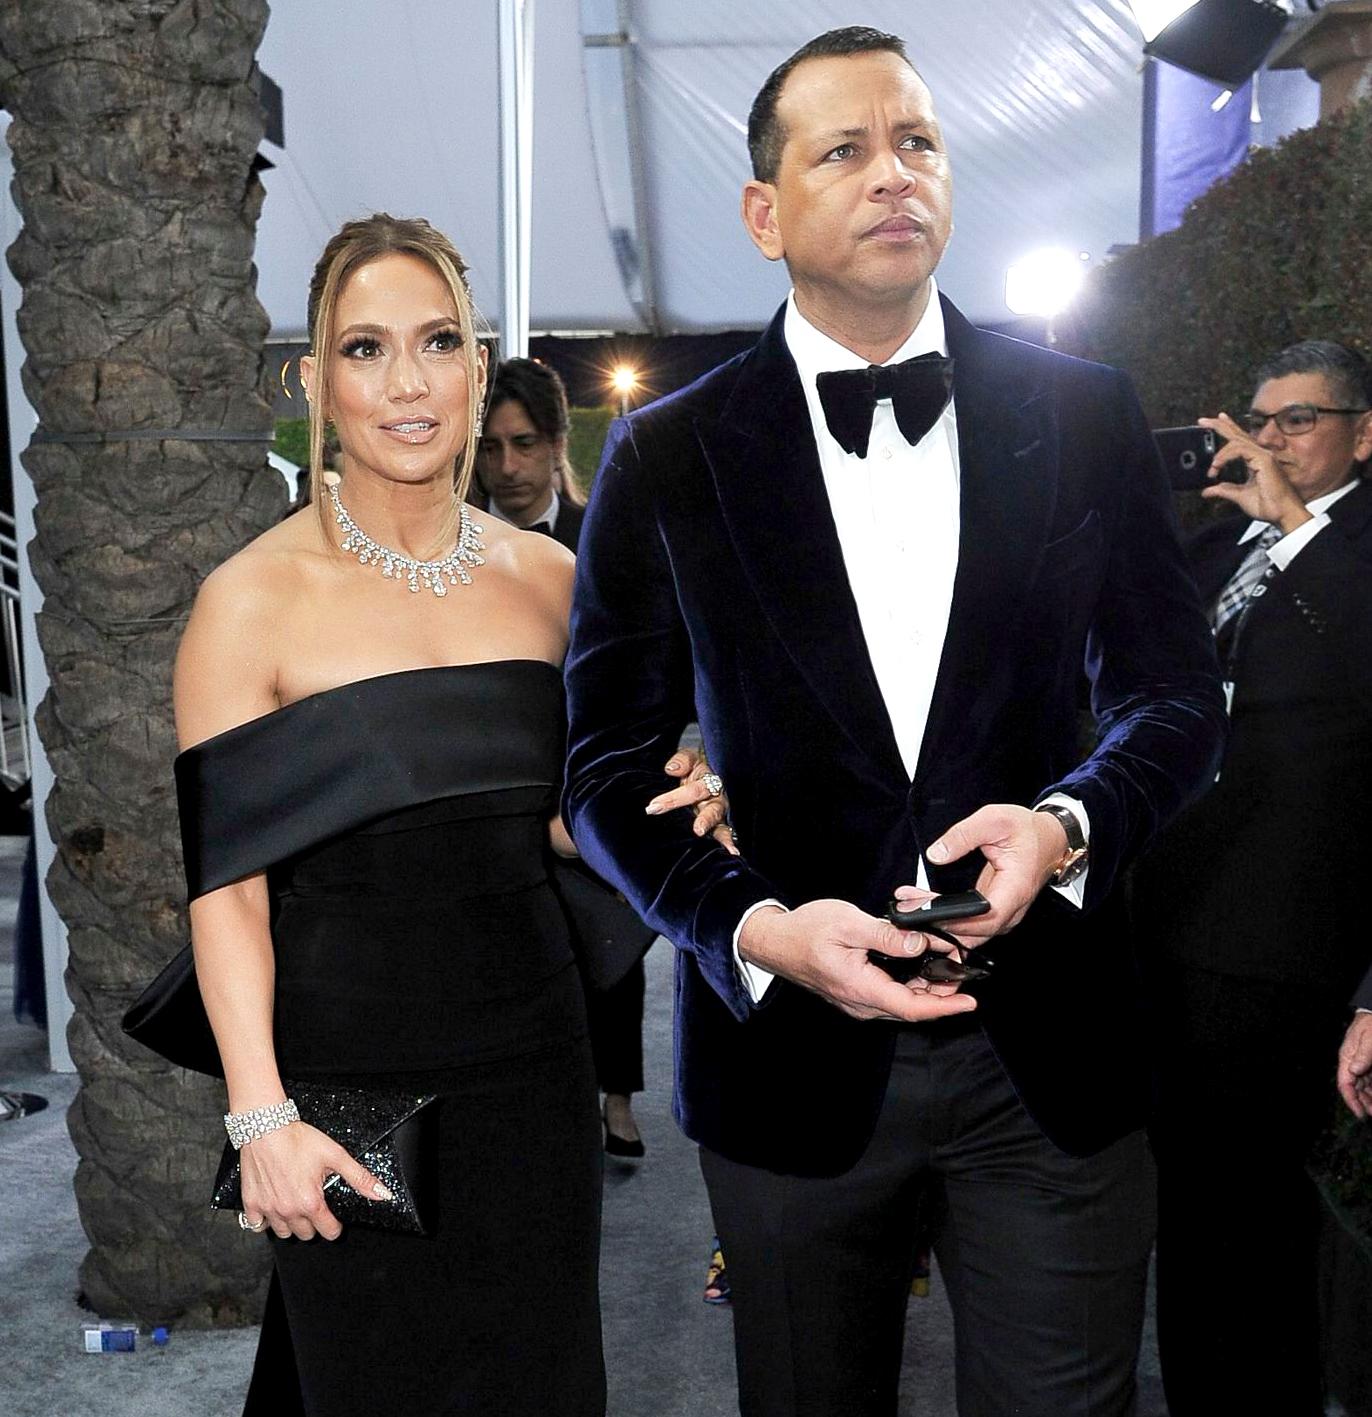 Alex Rodriguez Confirms His Wedding to Jennifer Lopez Pause Due to the Coronavirus Pandemic